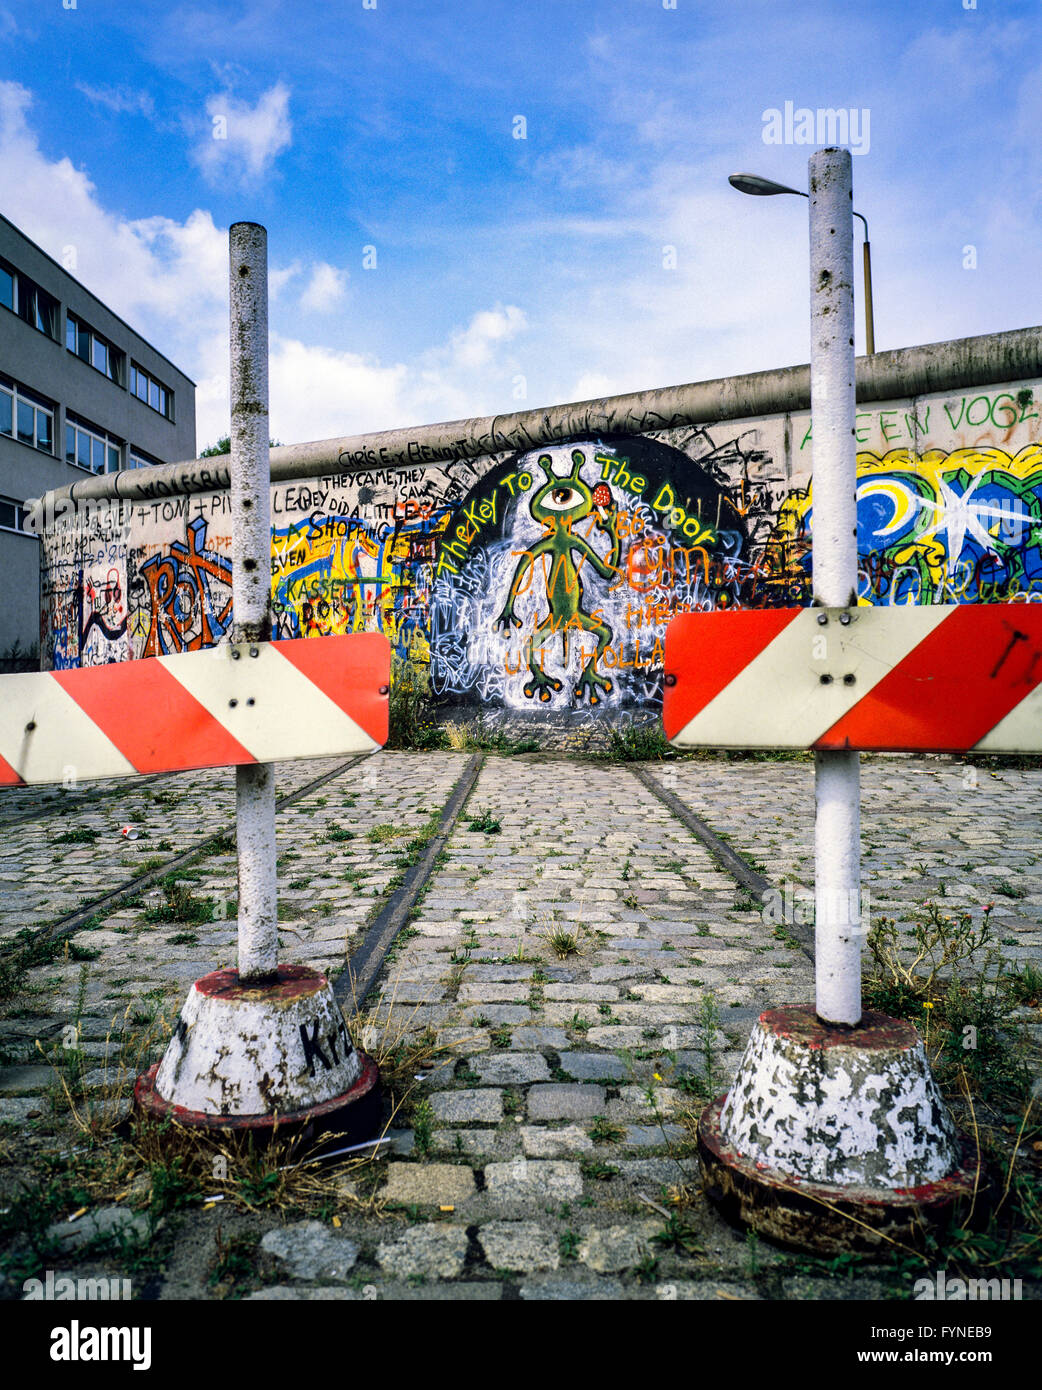 August 1986, Berlin Wall graffitis, tram track ending into wall, bollards, West Berlin side, Germany, Europe, - Stock Image